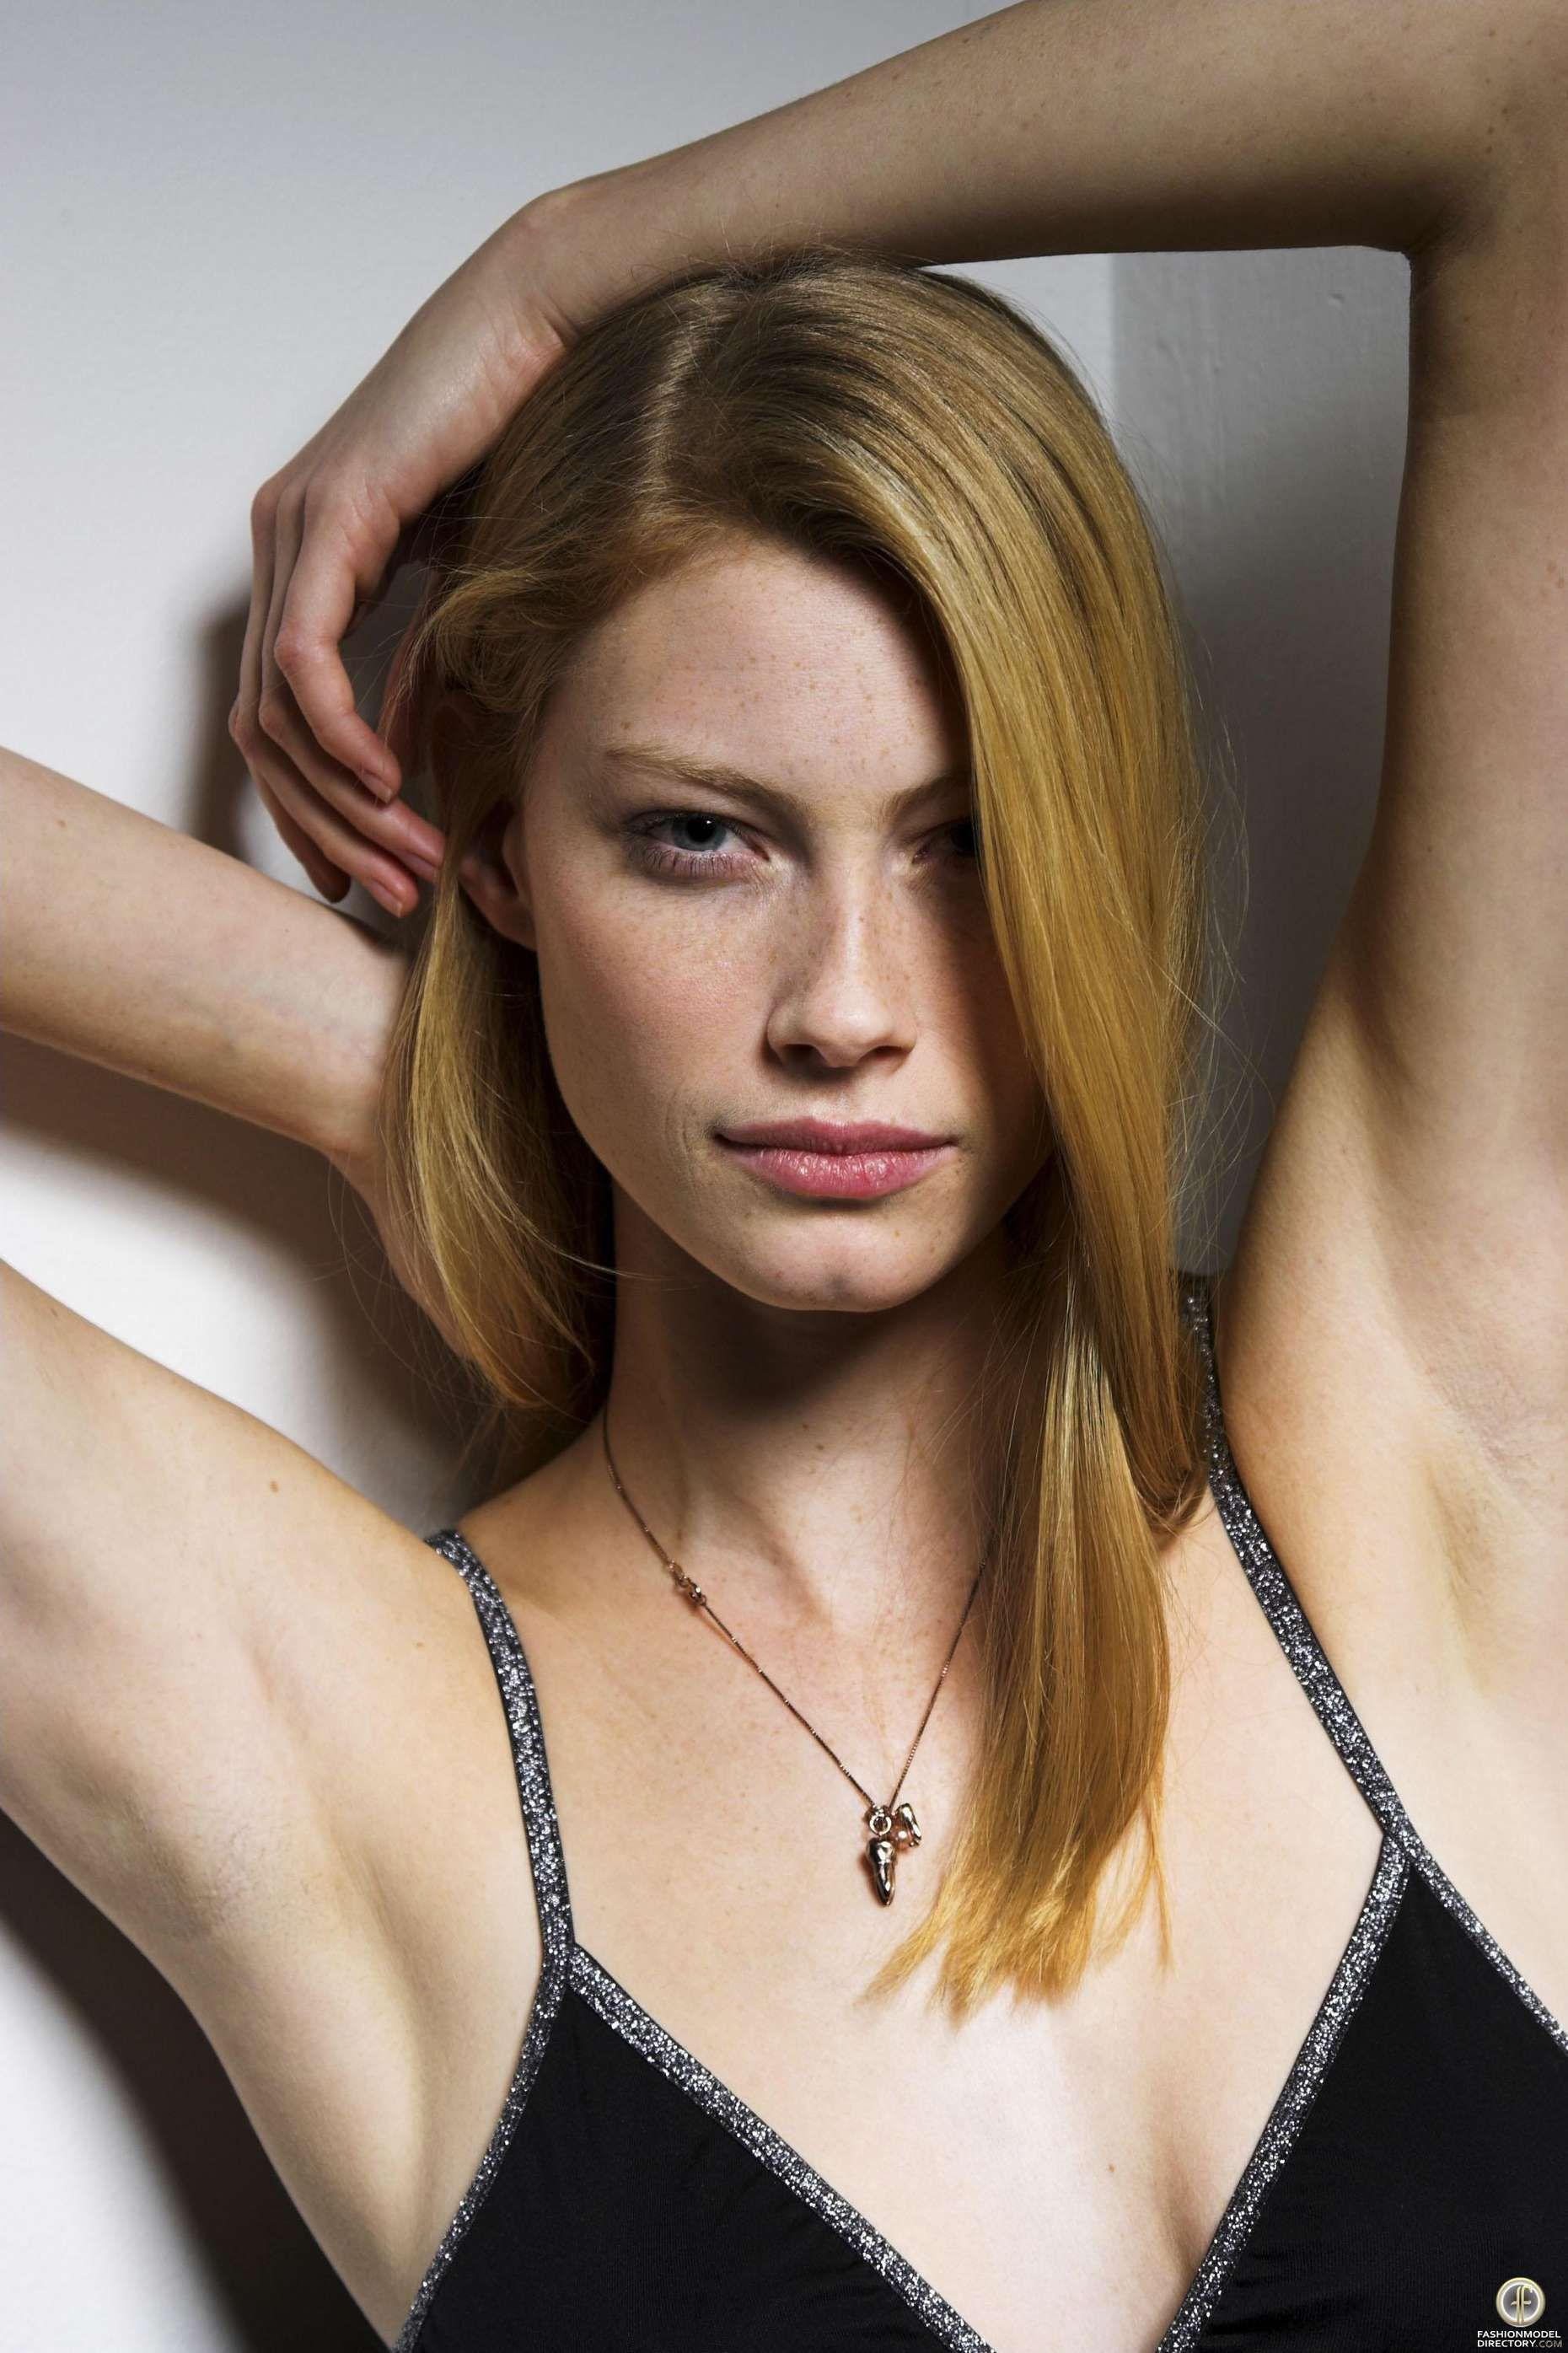 Alyssa sutherland model nude (23 image)